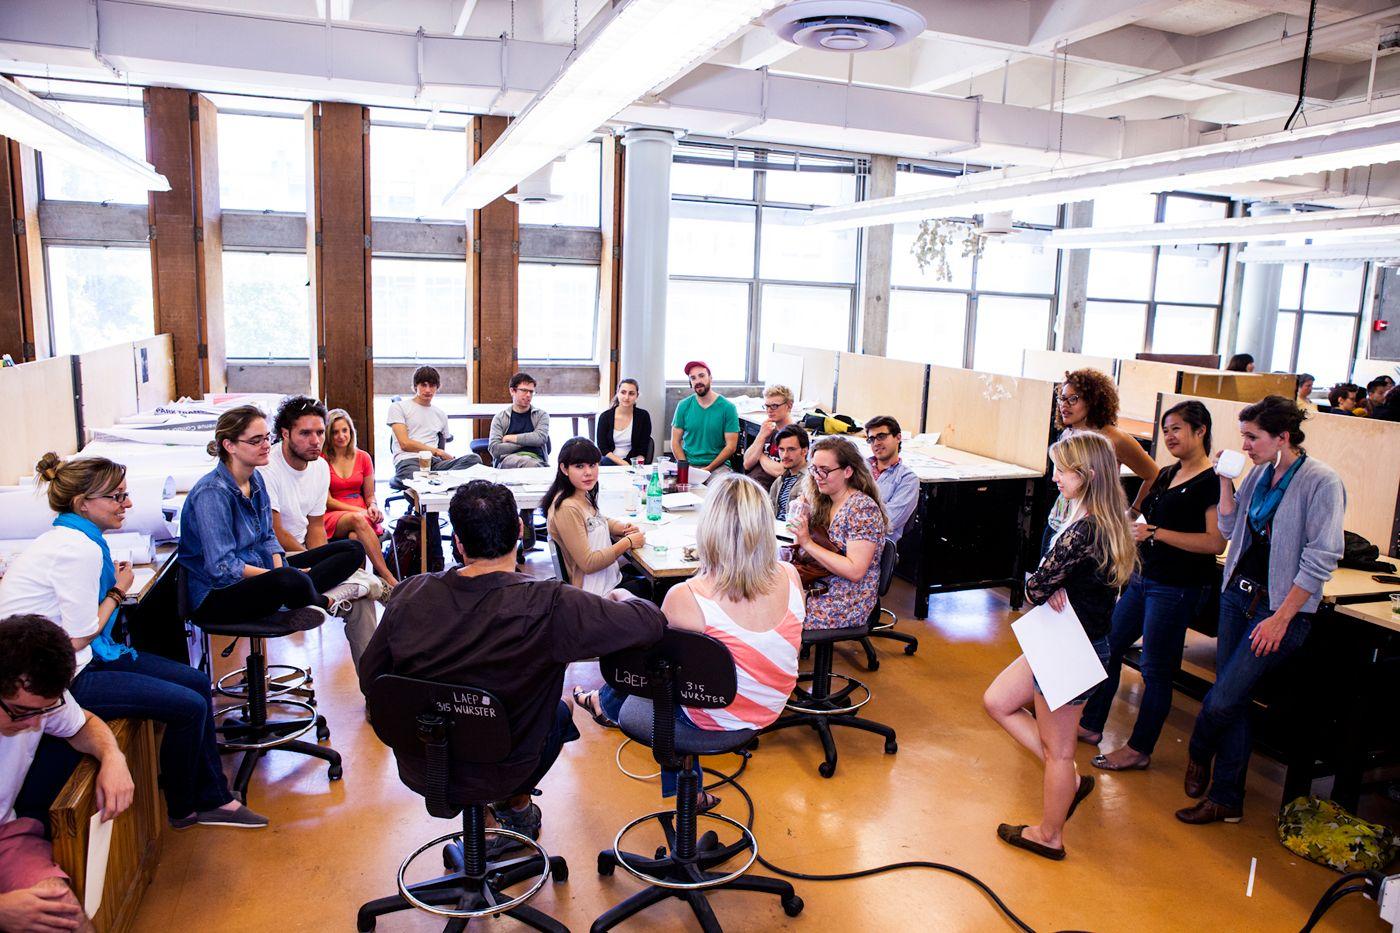 Uc Berkeley Ced Studio San Francisco State University Teaching Plan Environmental Justice